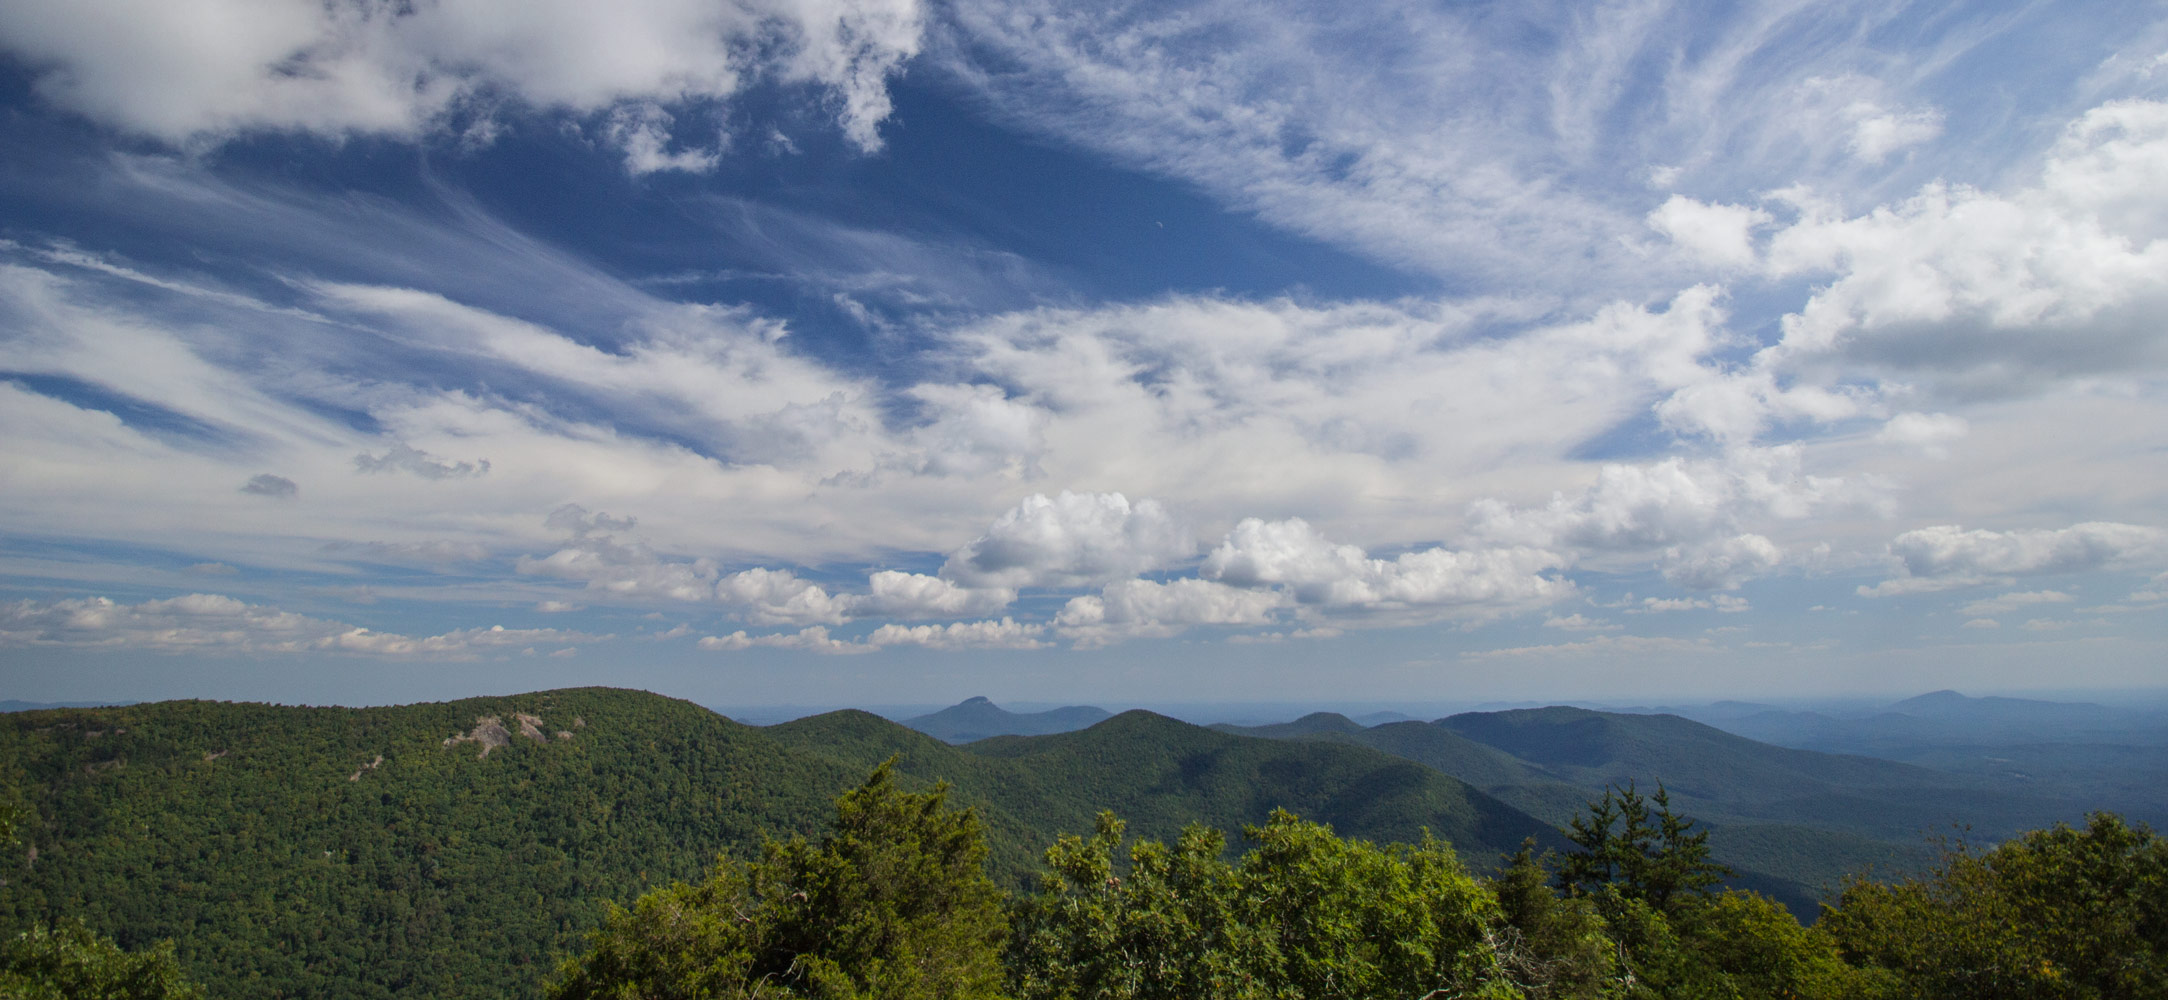 Georgia – Chattahoochee Oconee National Forest